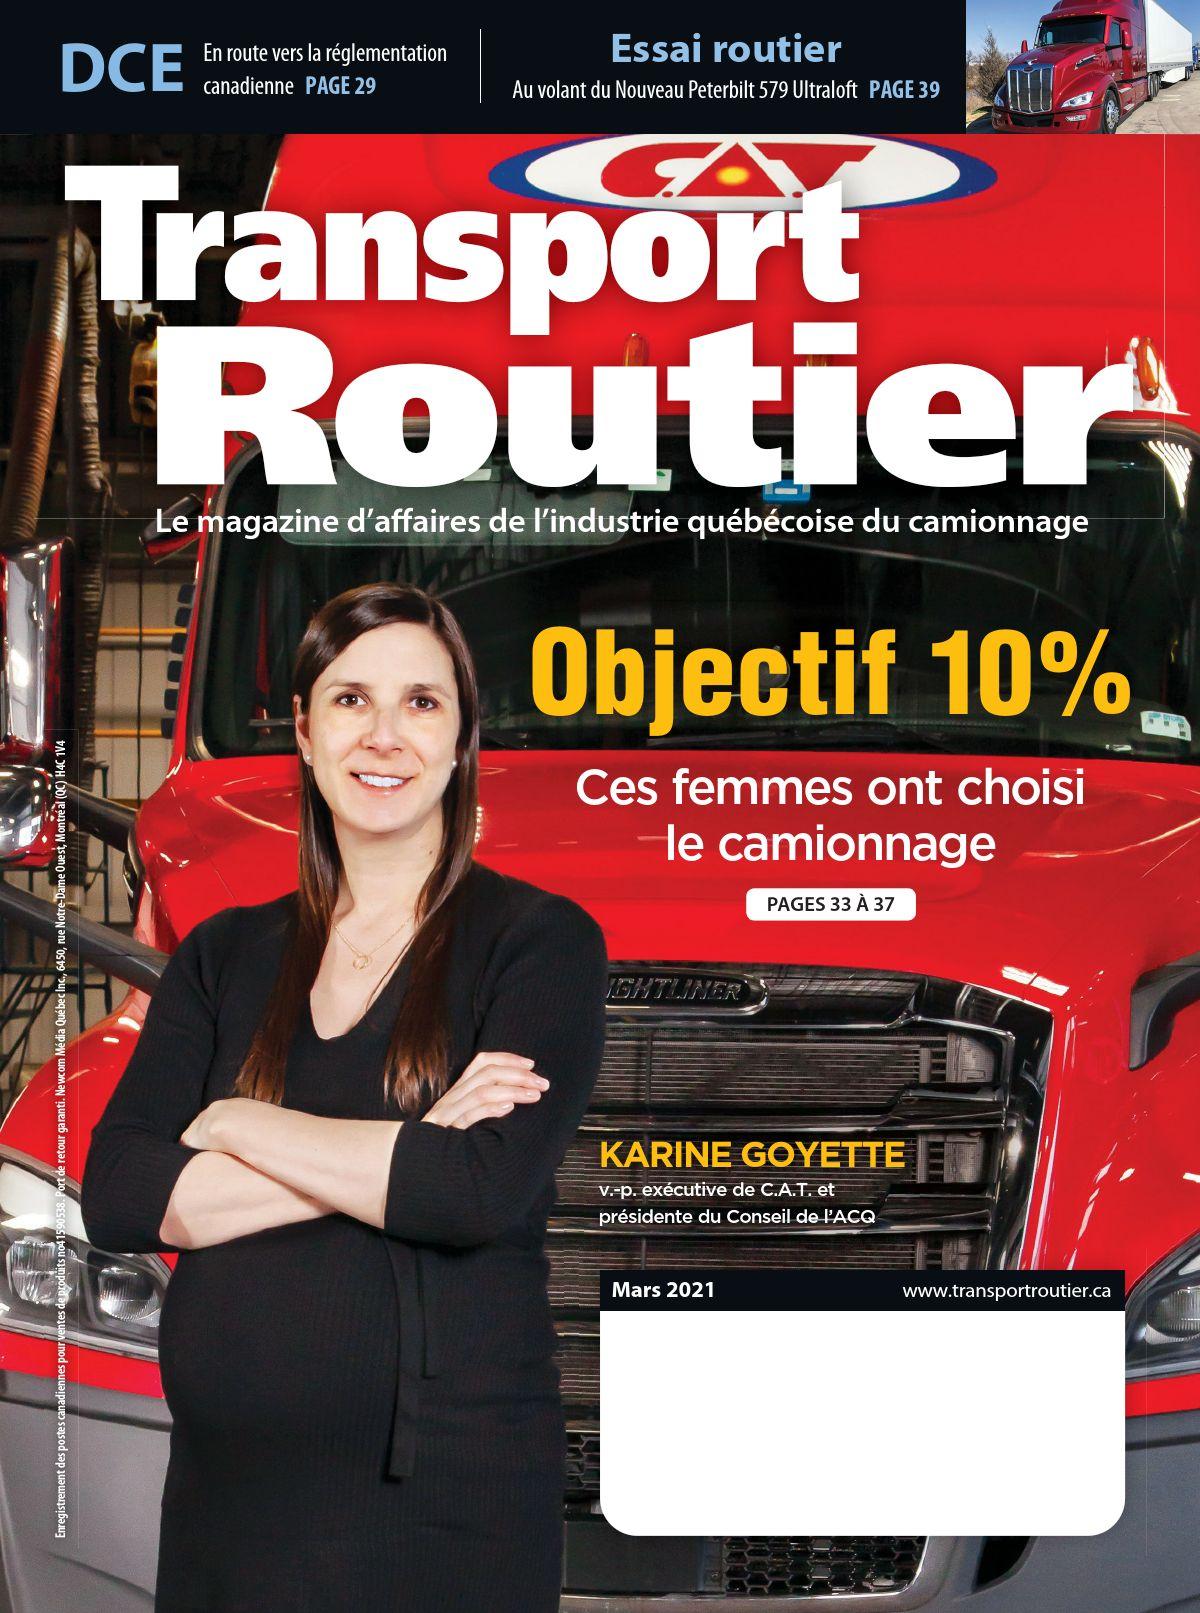 Transport routier – 1 mars 2021